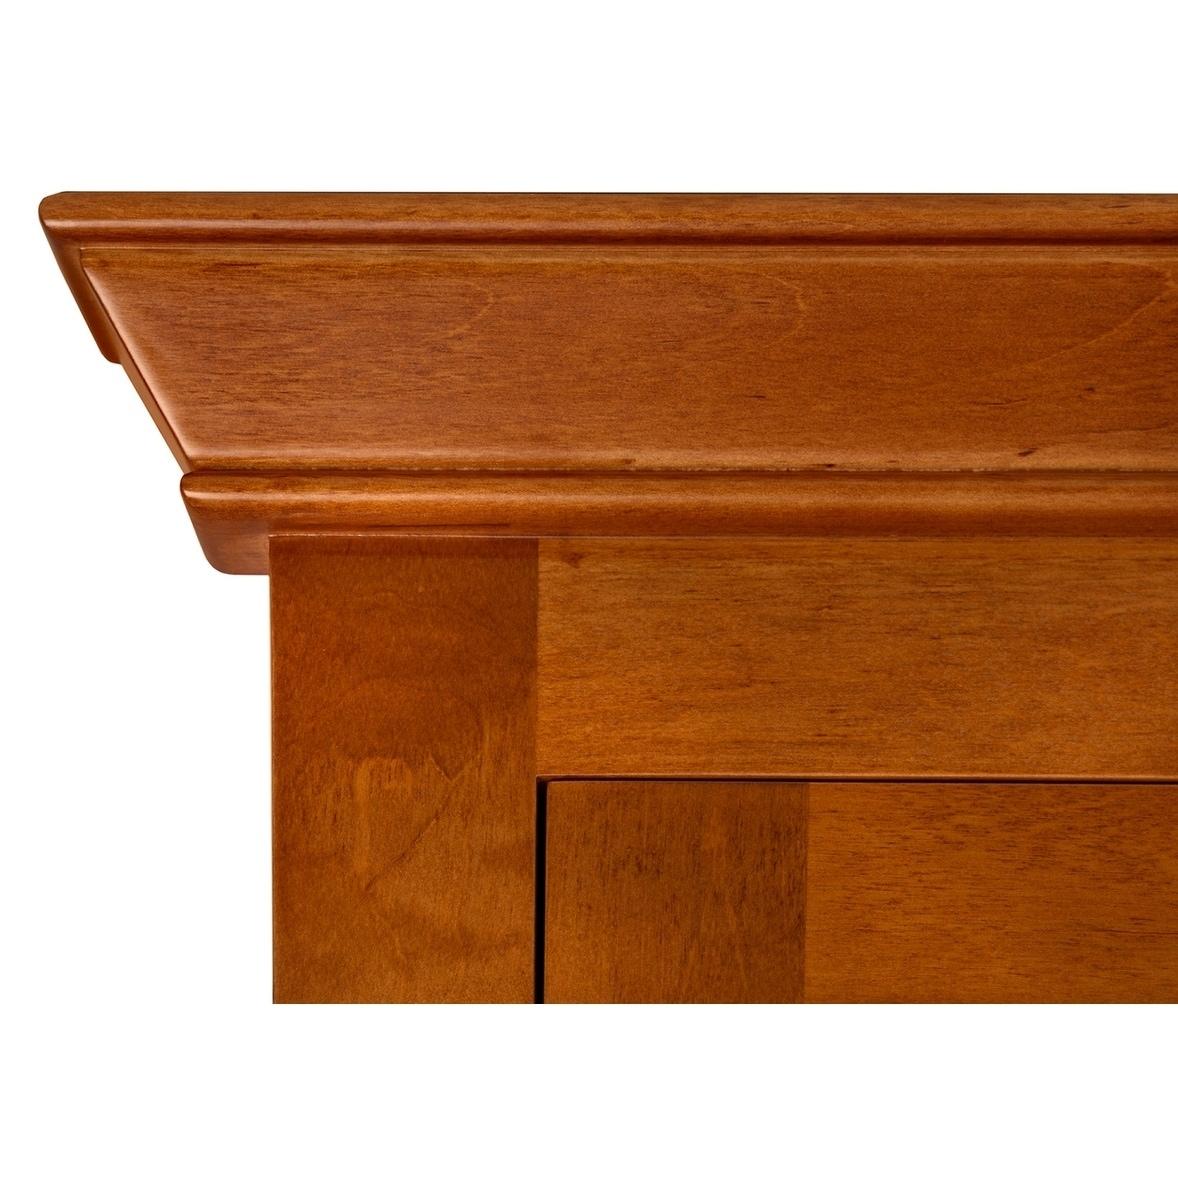 27 Tristan Transitional Solid Wood Framed Medicine Cabinet In Cinnamon